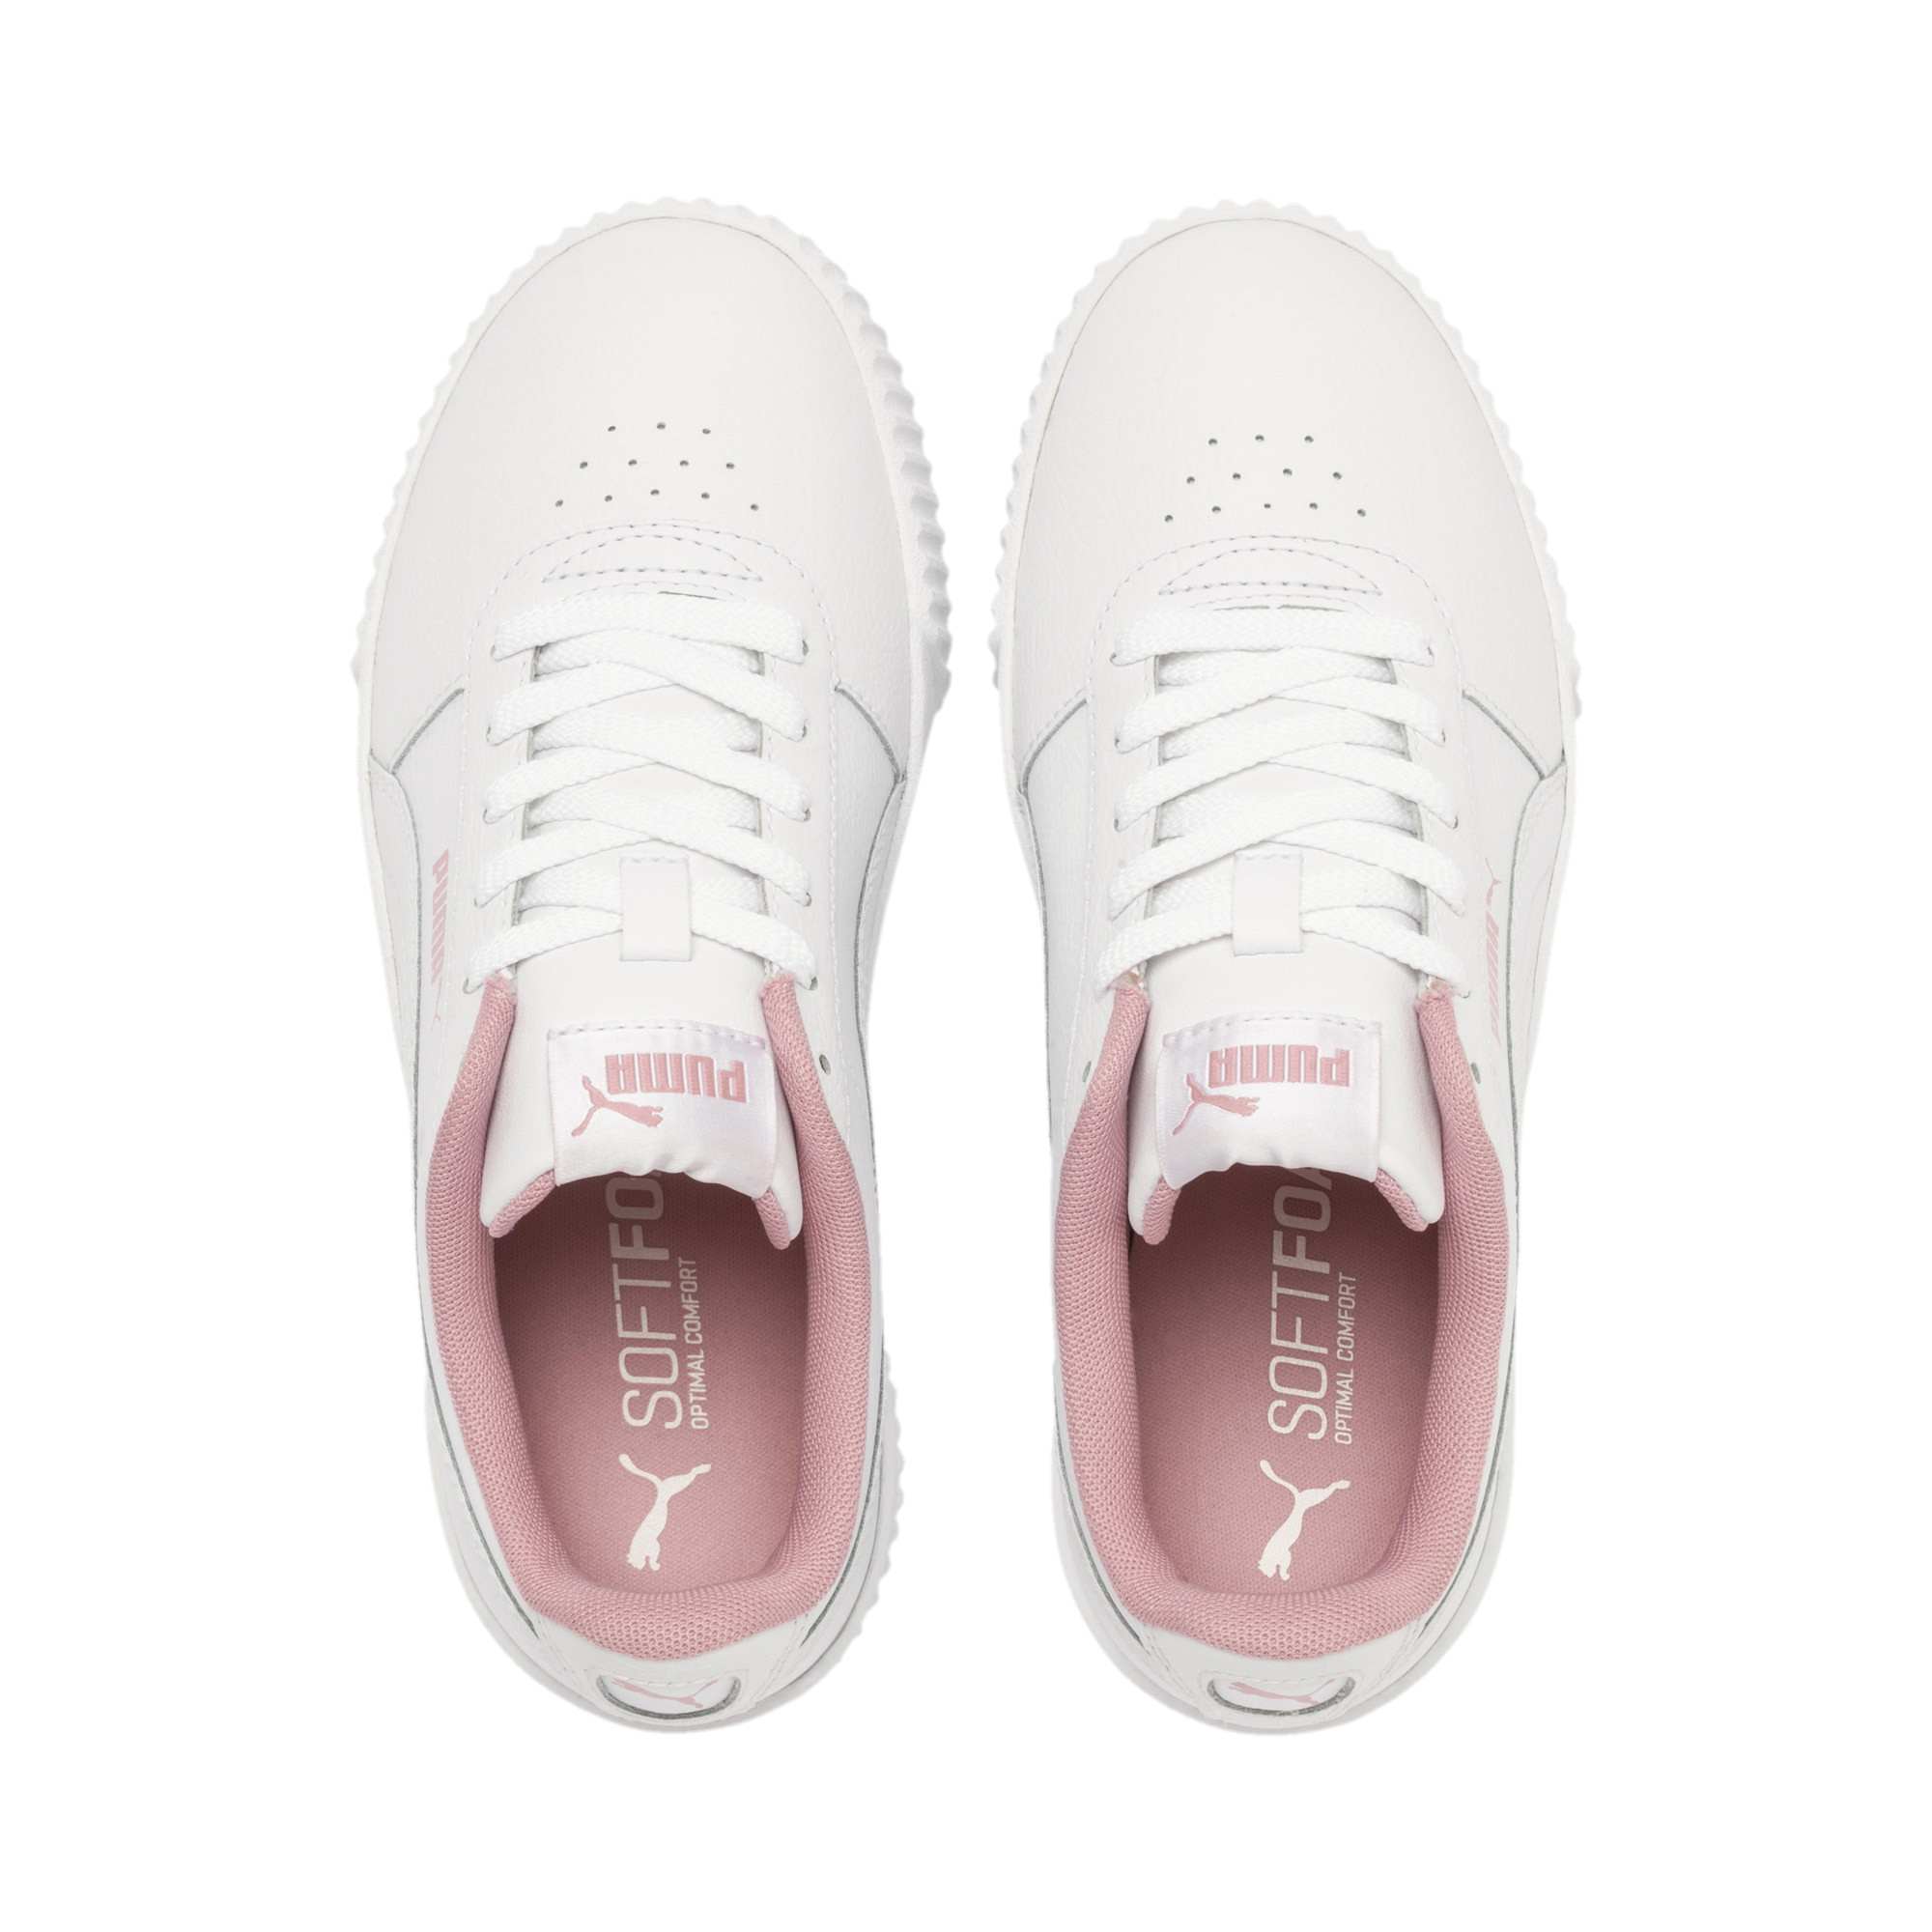 Puma Carina L Youth Sneakers